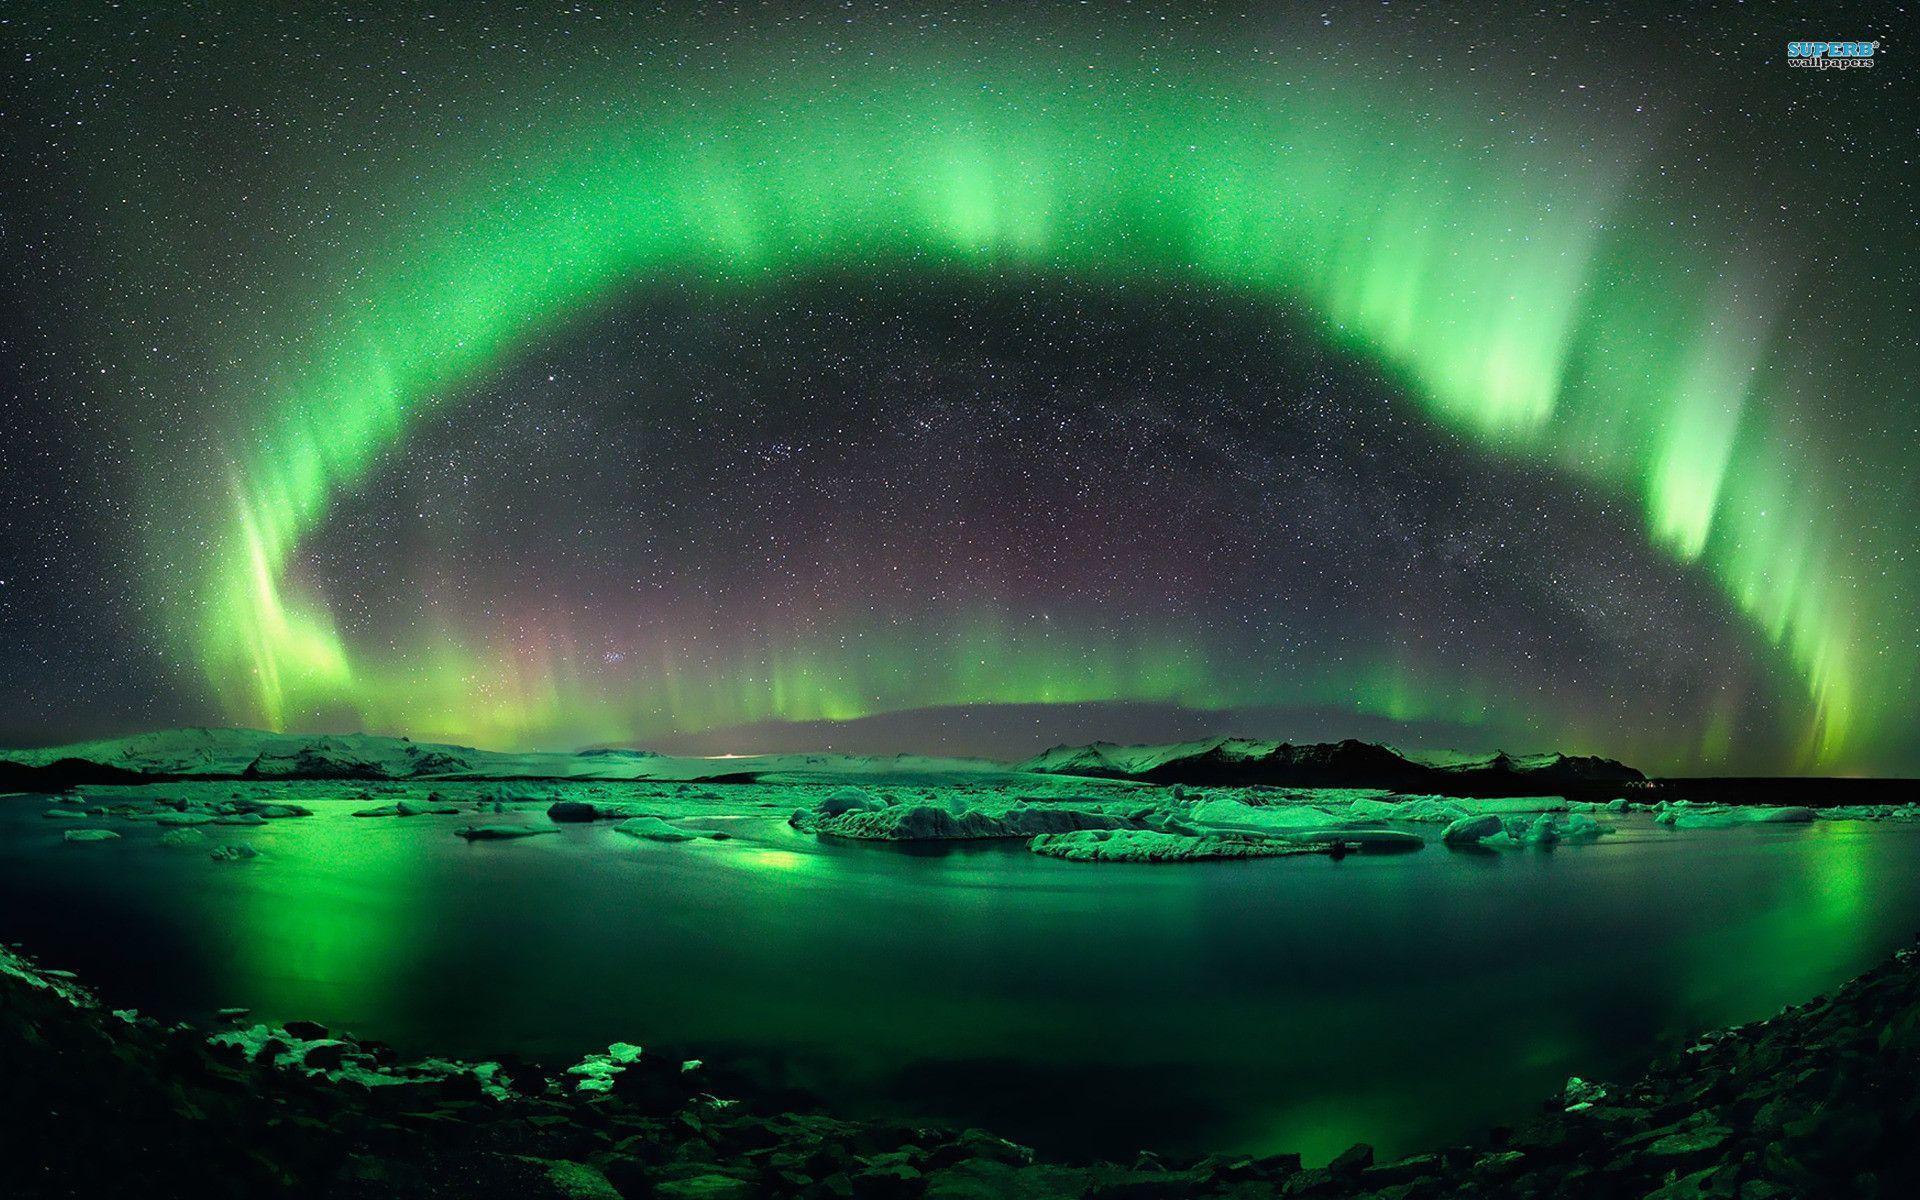 aurora borealis wallpapers - wallpaper cave